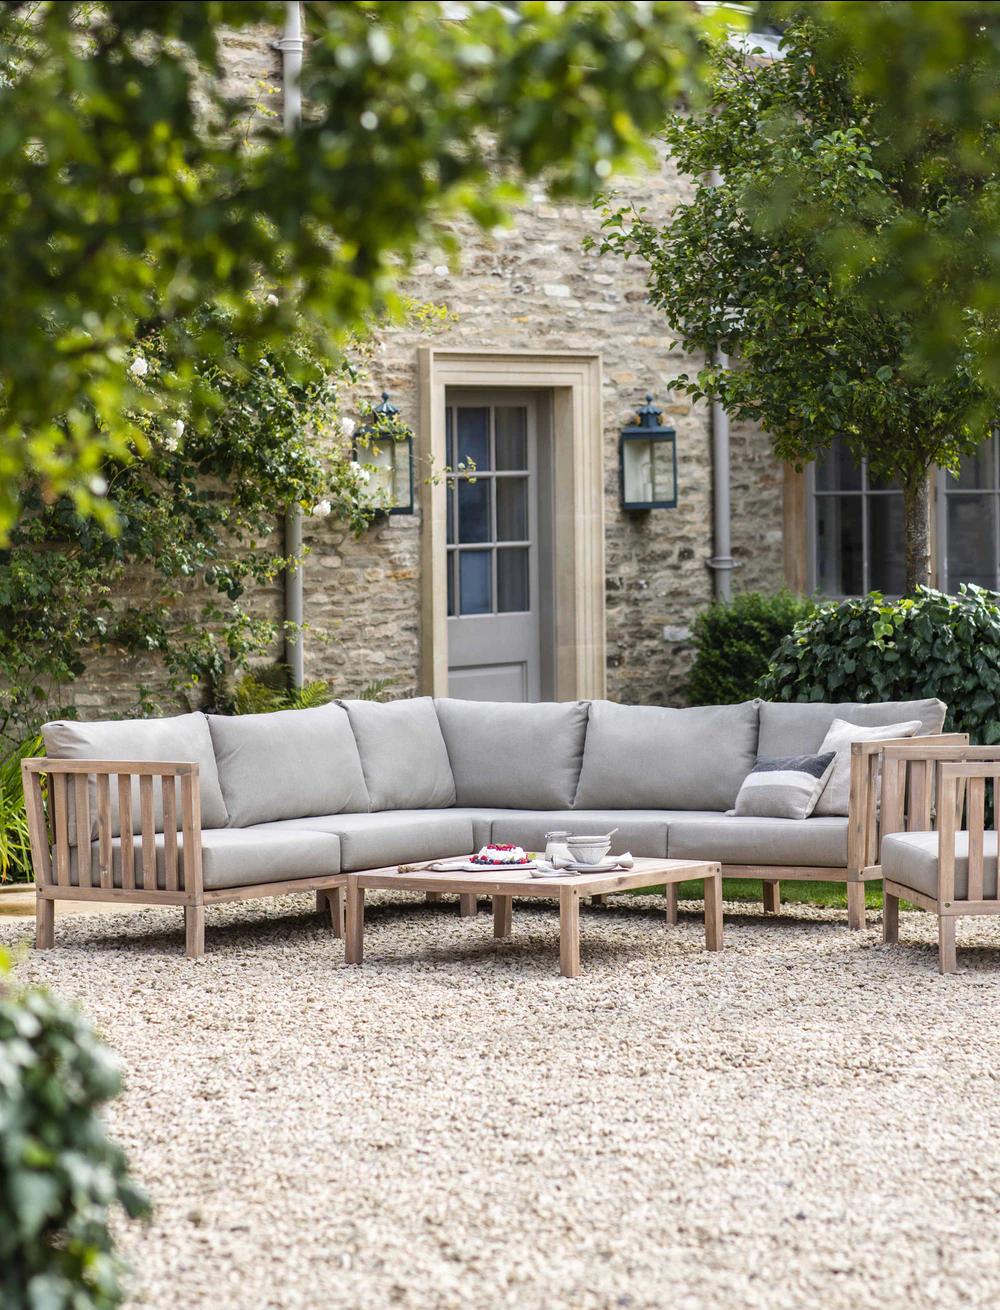 Porthallow Corner Sofa Set in 8  Garden sofa set, Outdoor sofa